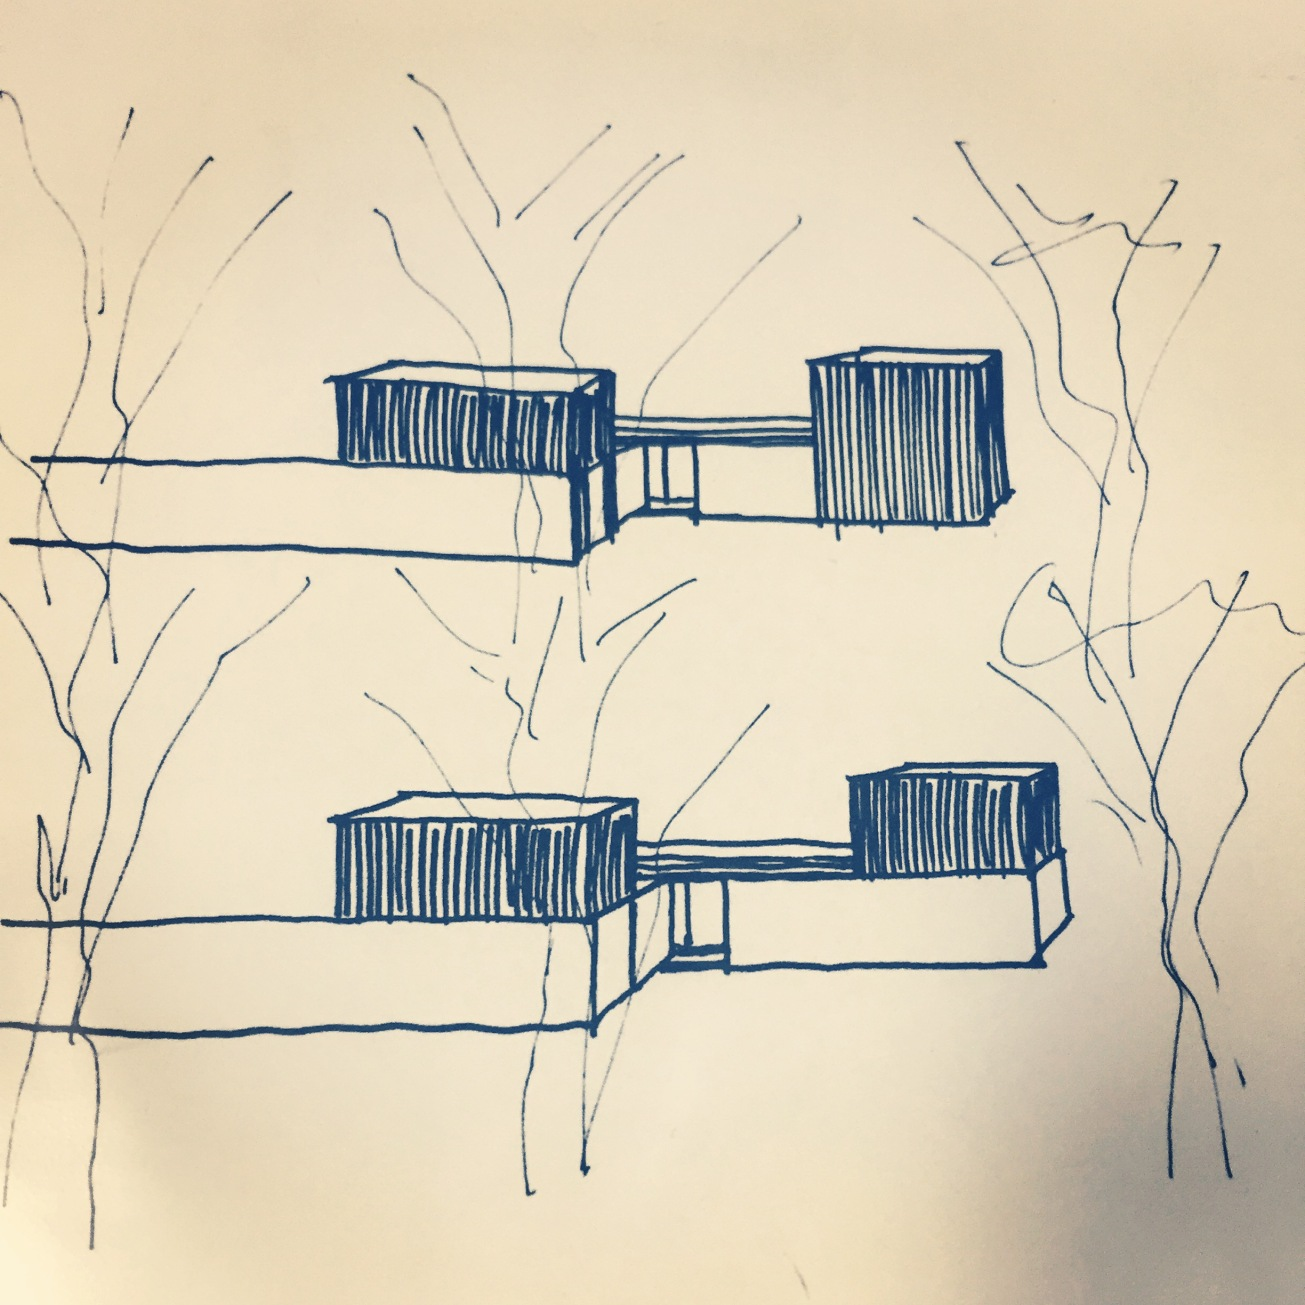 Sketch by A.Mazin